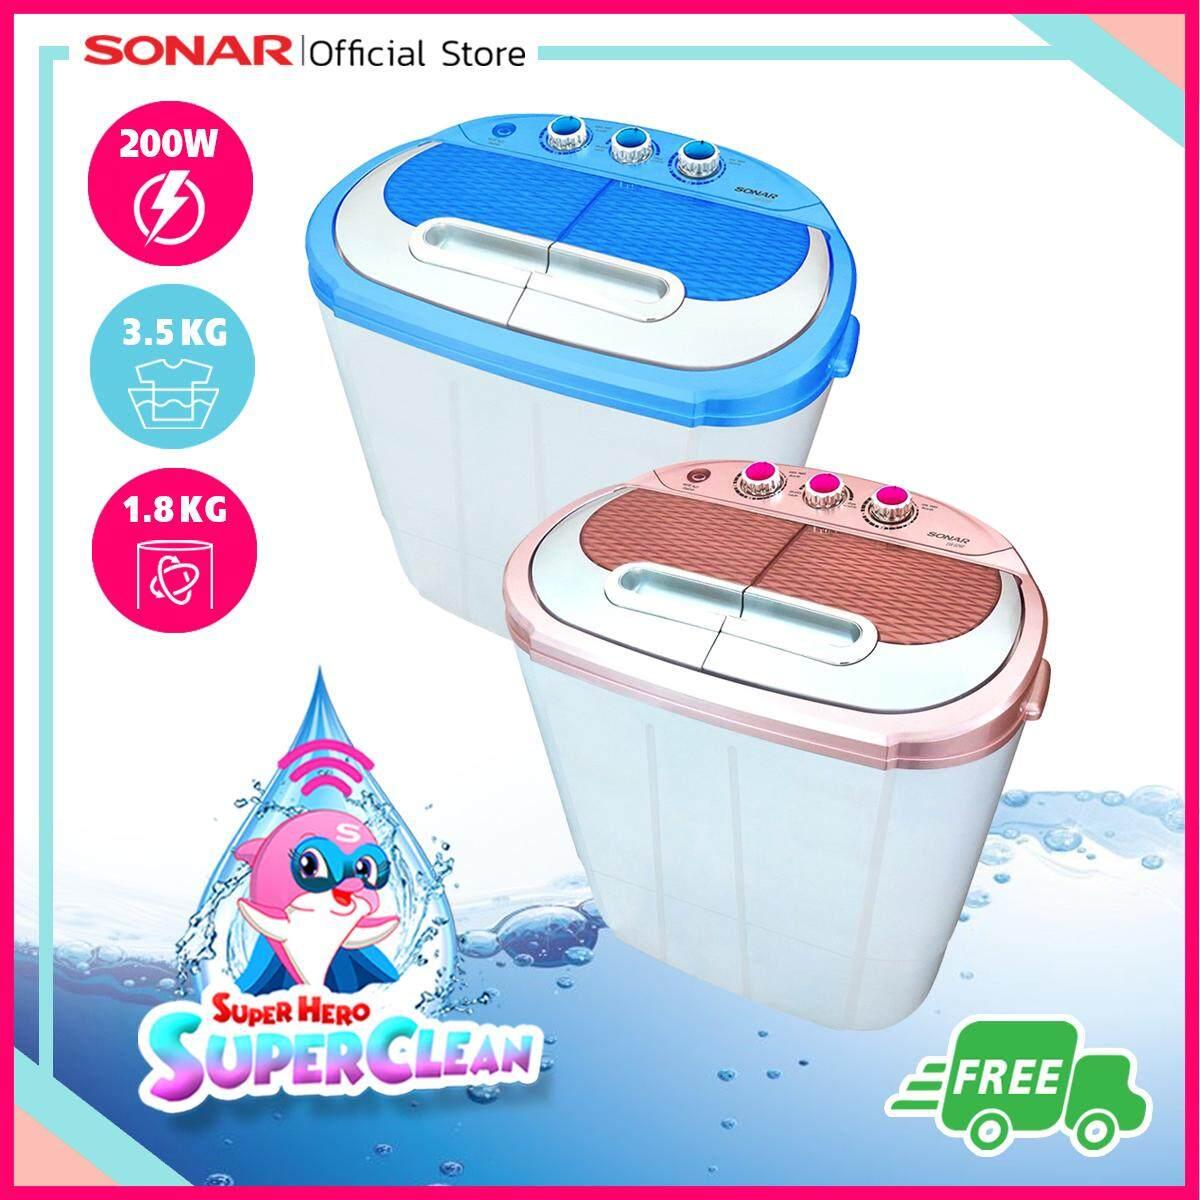 Sonar เครื่องซักผ้า เครื่องซักผ้ามินิ เครื่องซักผ้าขนาดเล็ก เครื่องซักผ้า 2 ถัง ฝาบน รุ่น Ew-S260 By Sonar Thailand Shop.